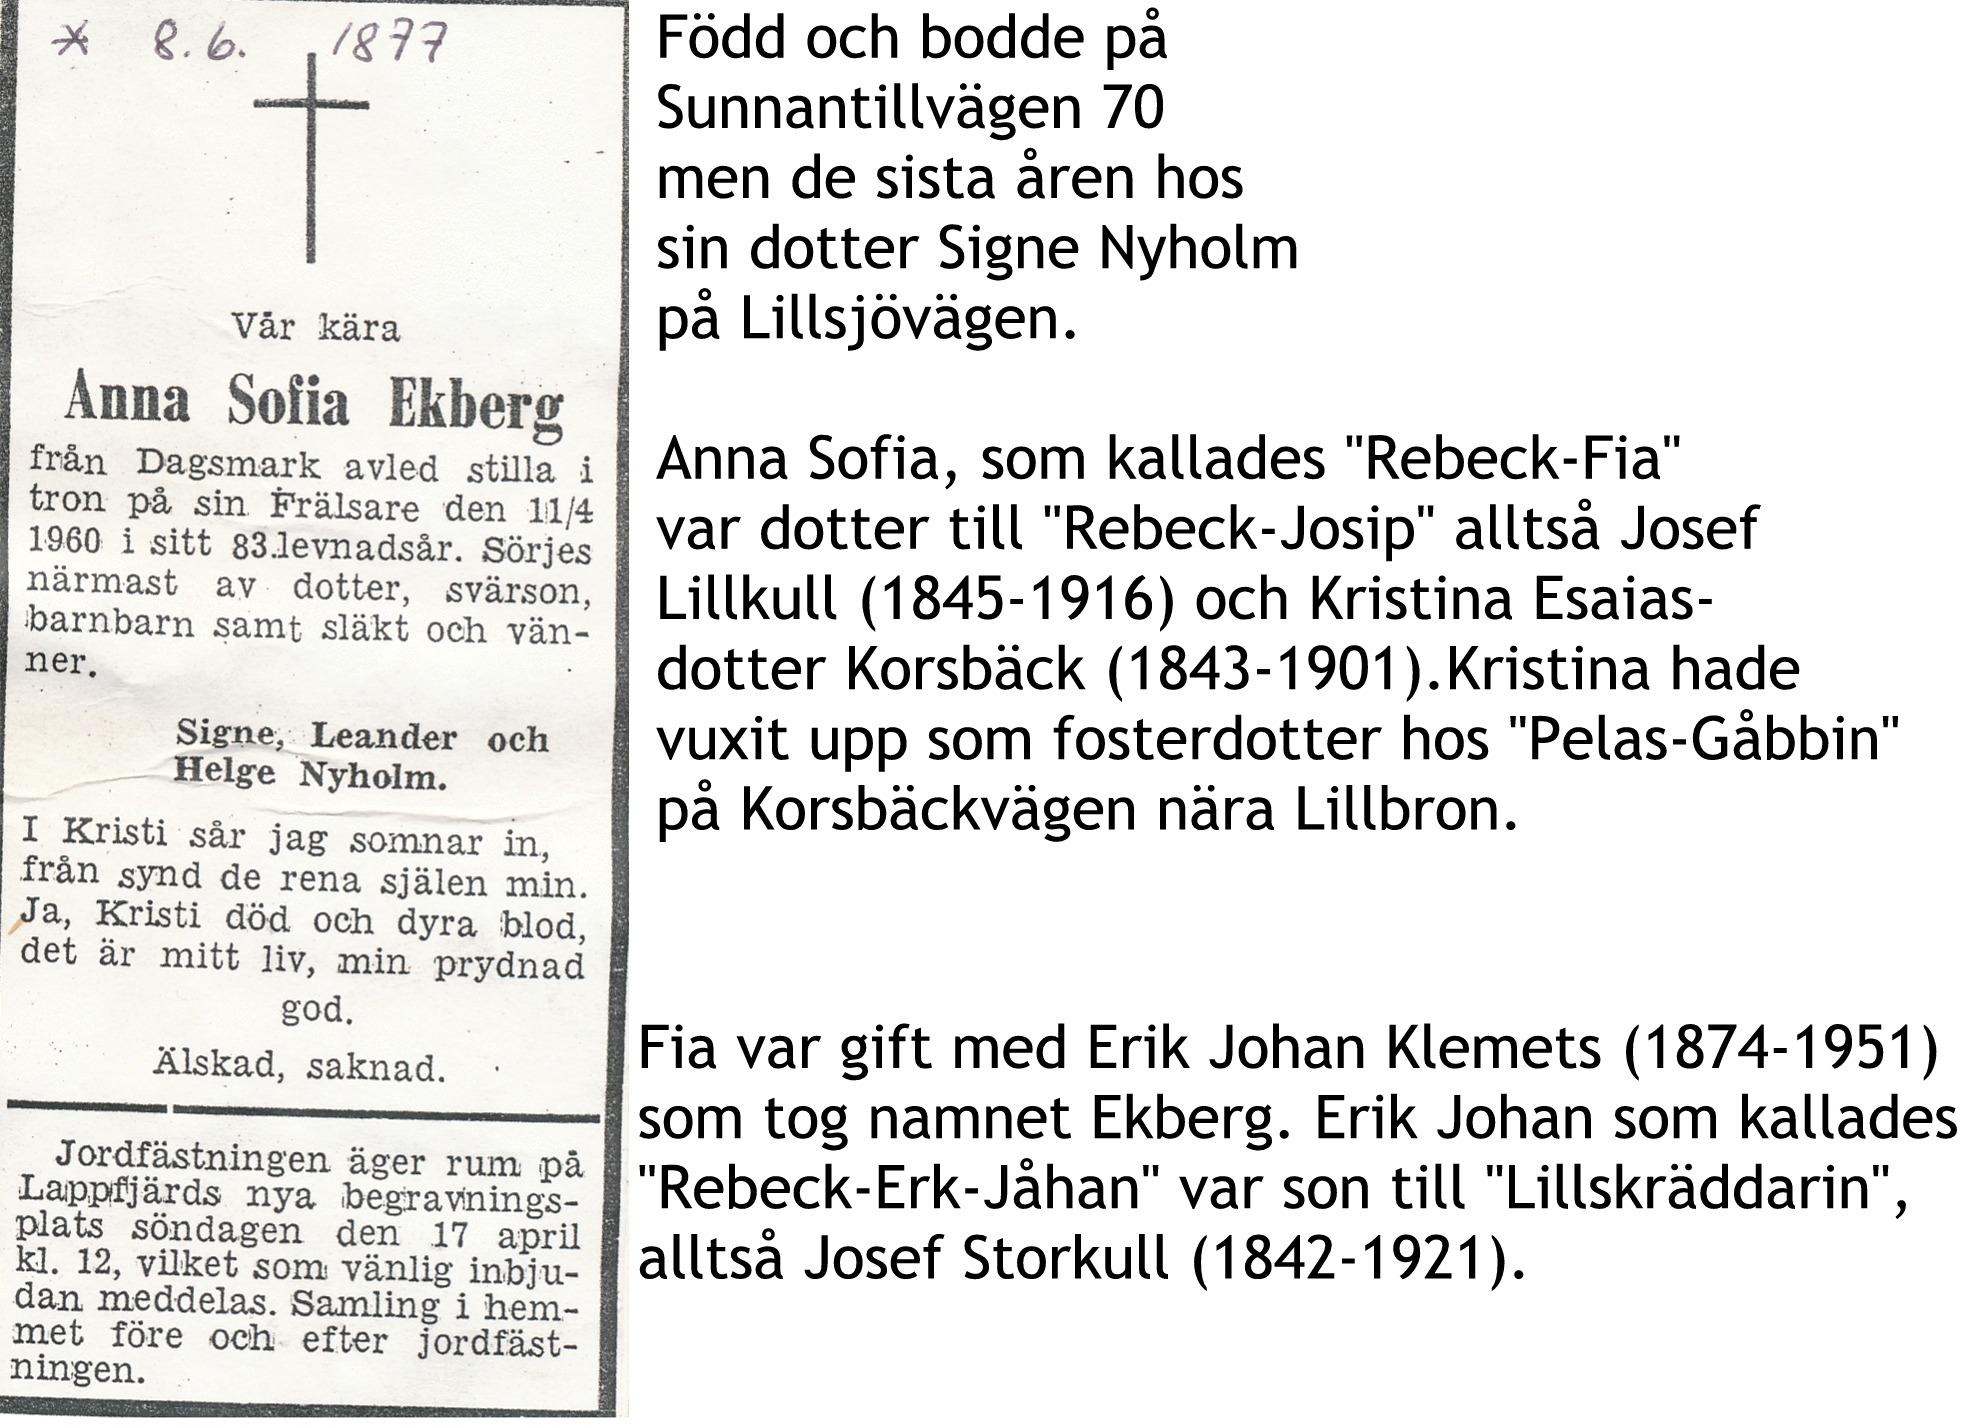 Ekberg Fia, Anna Sofia